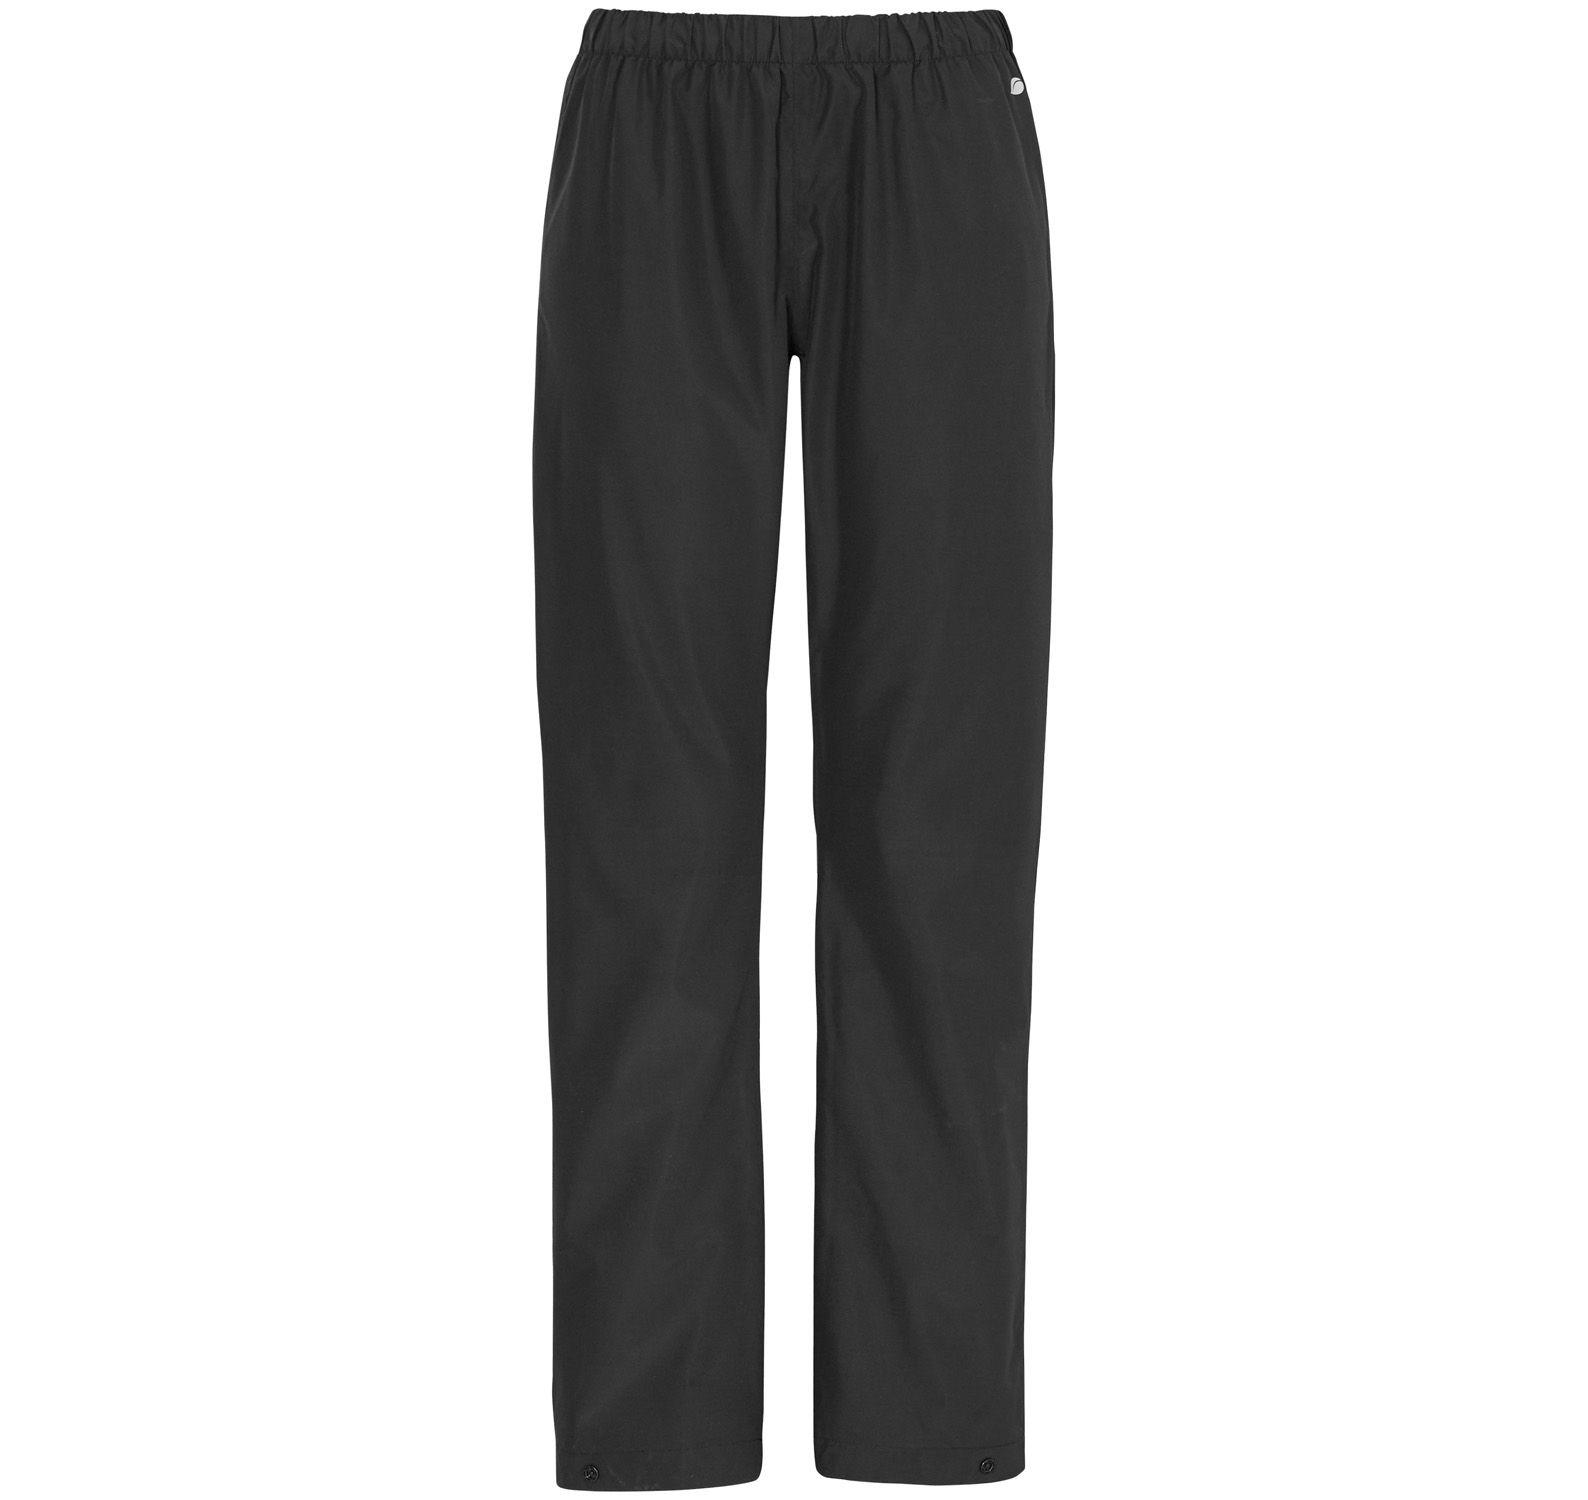 grand wns pants, black, 36, didriksons regnkläder